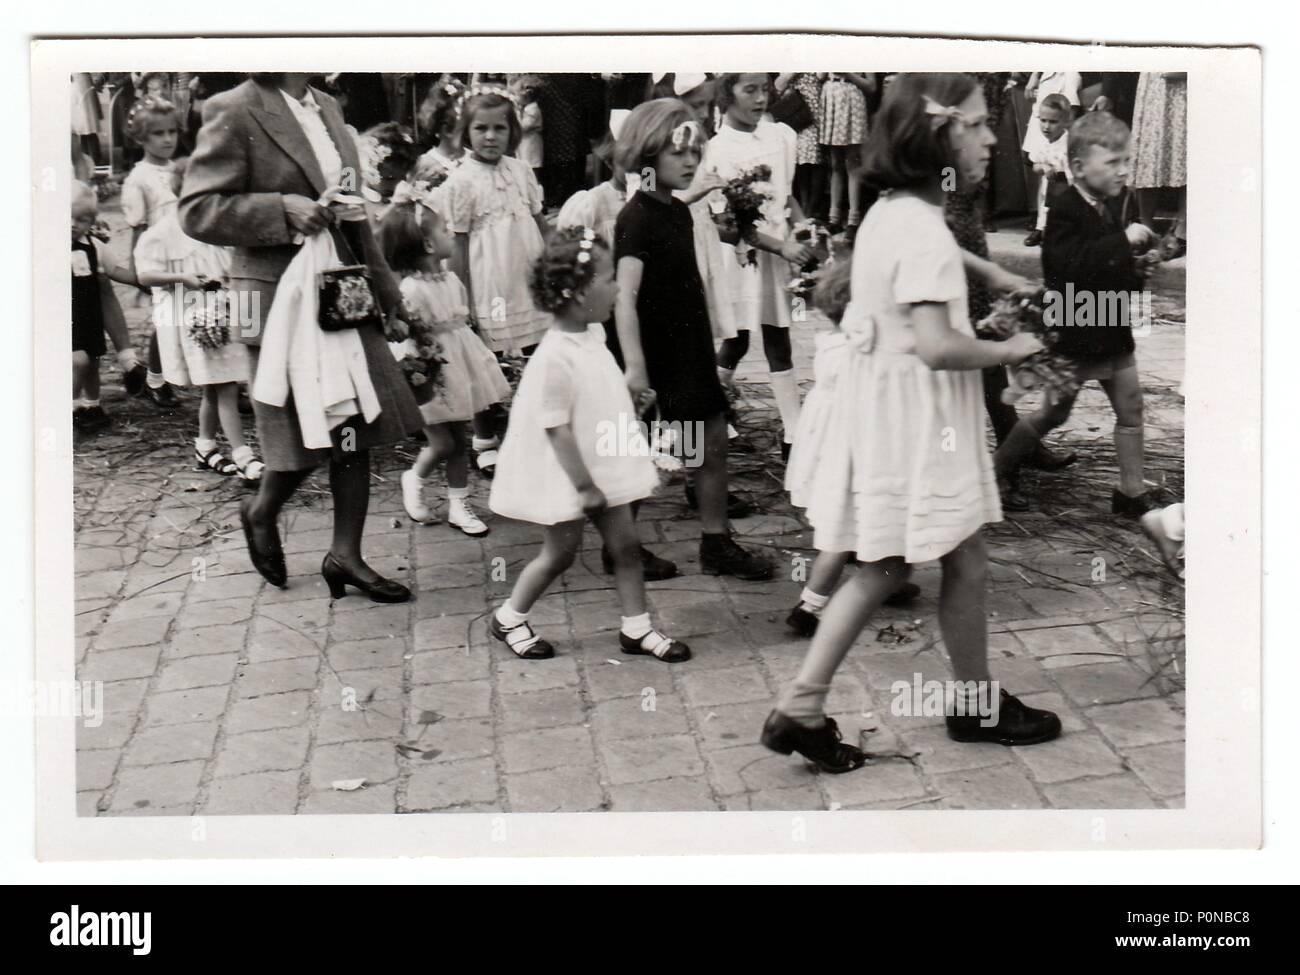 HODONIN, THE CZECHOSLOVAK REPUBLIC, CIRCA 1943: Vintage photo shows religious (catholic) celebration, circa 1943. - Stock Image